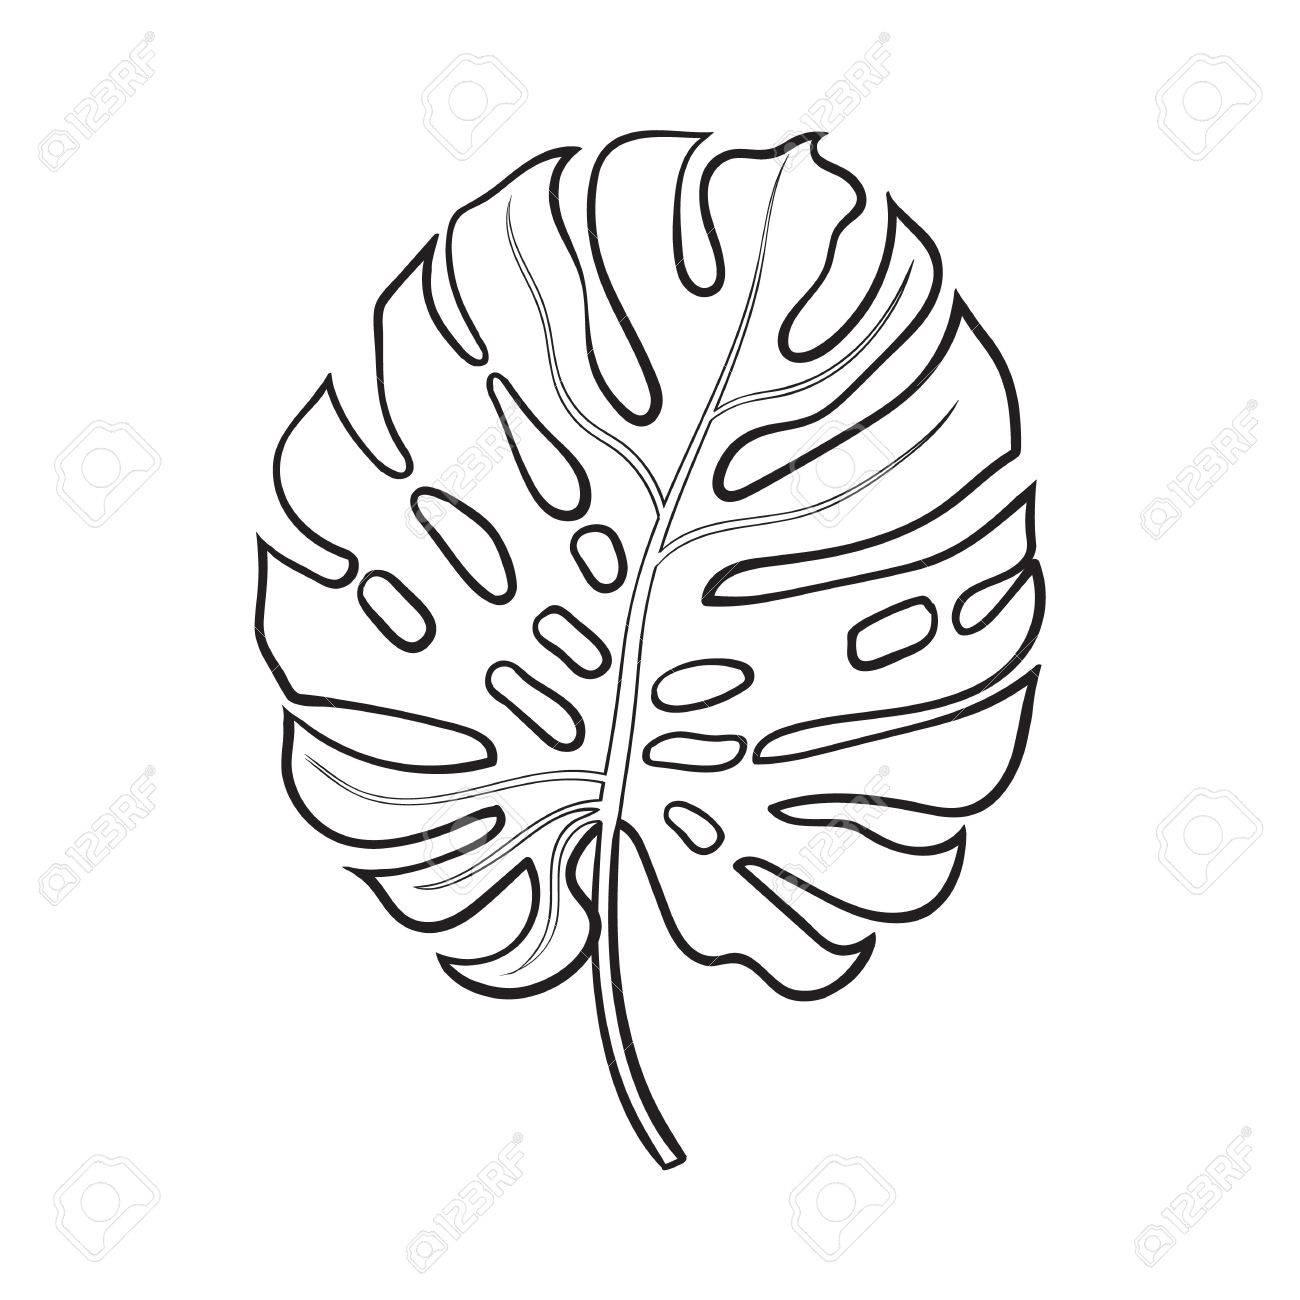 Tropical Leaves Drawing At Getdrawings